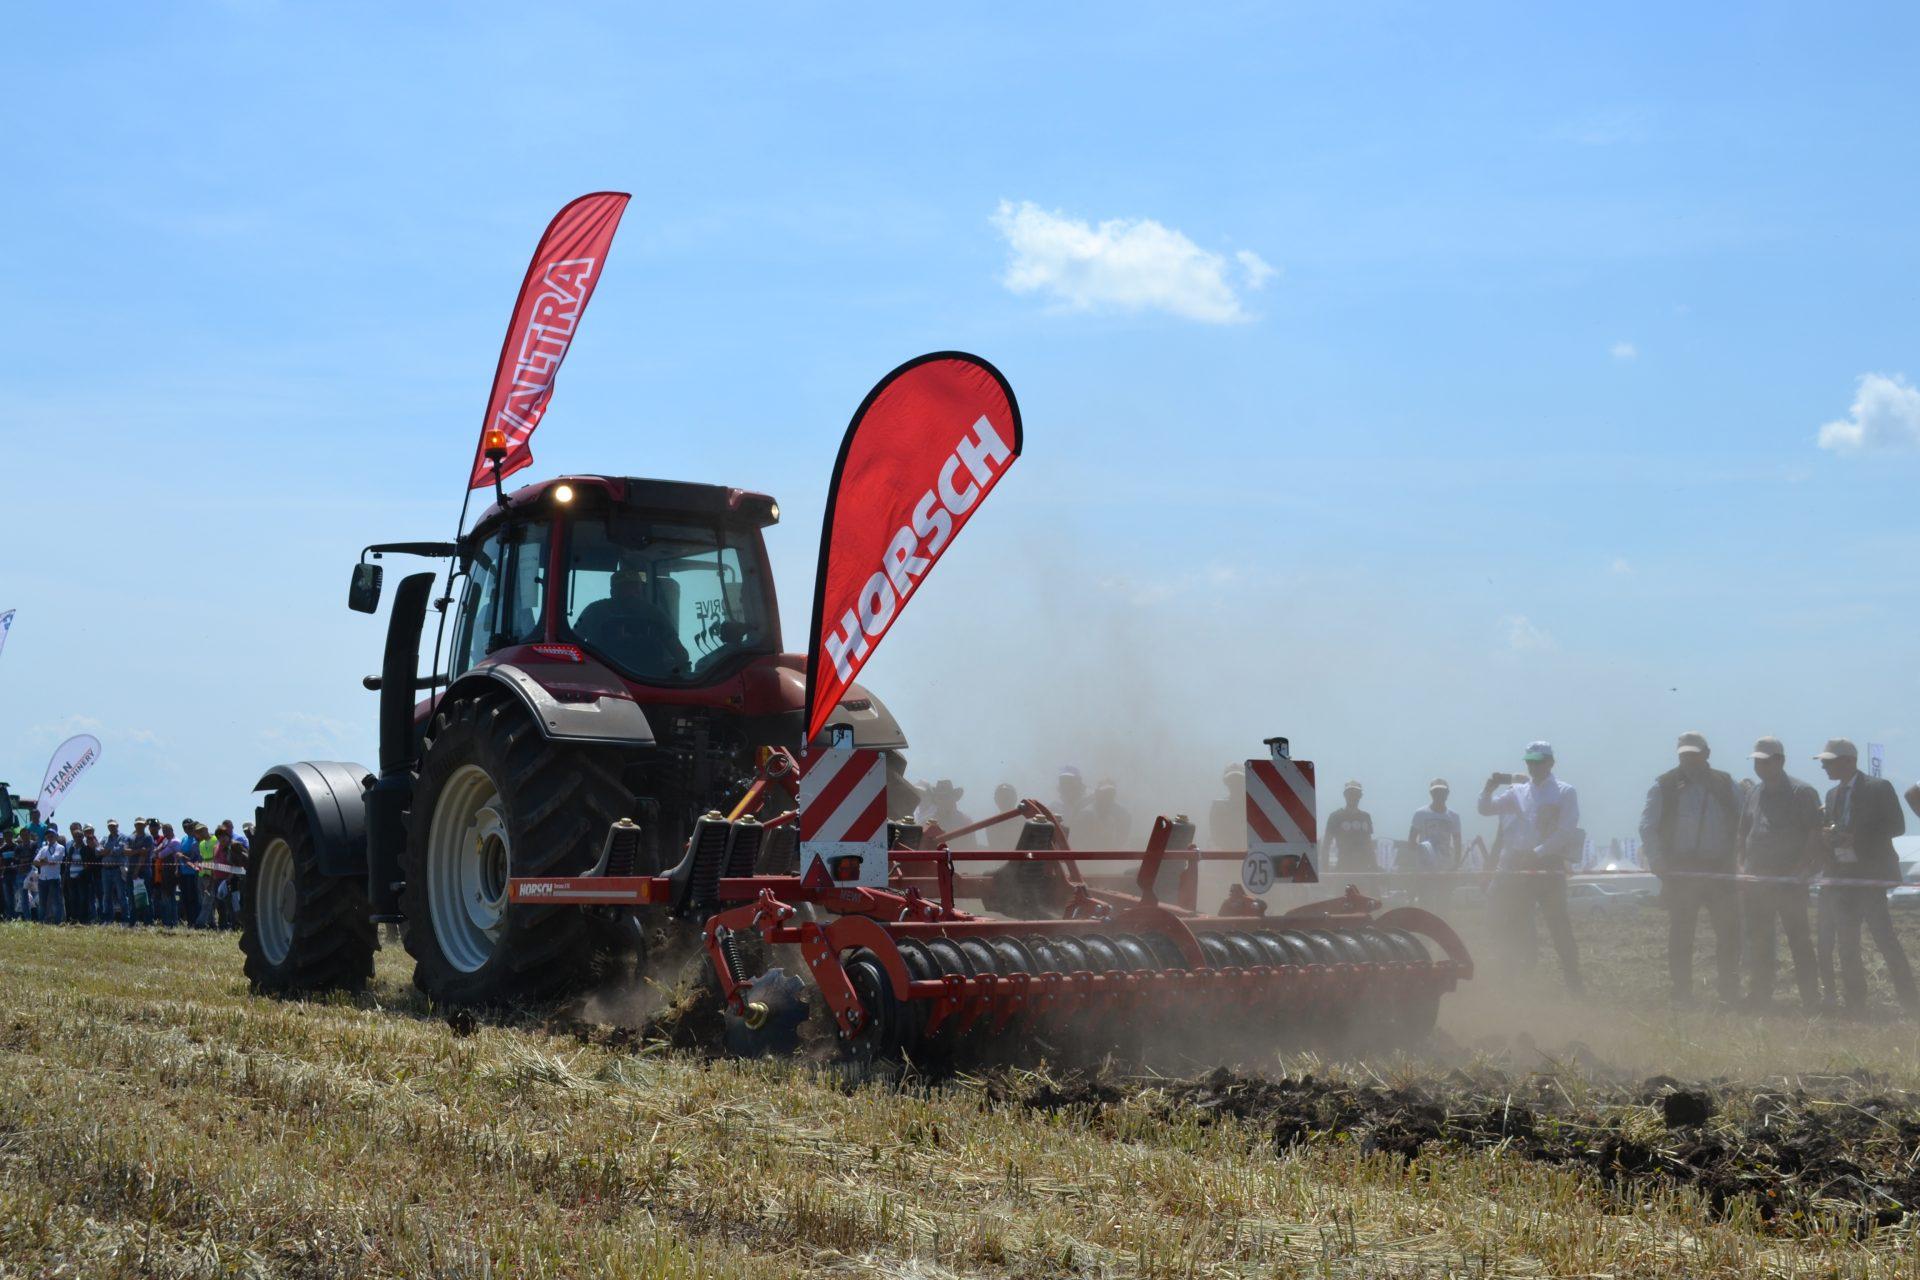 Cultivator Horsch TERRANO FX la demonstrații